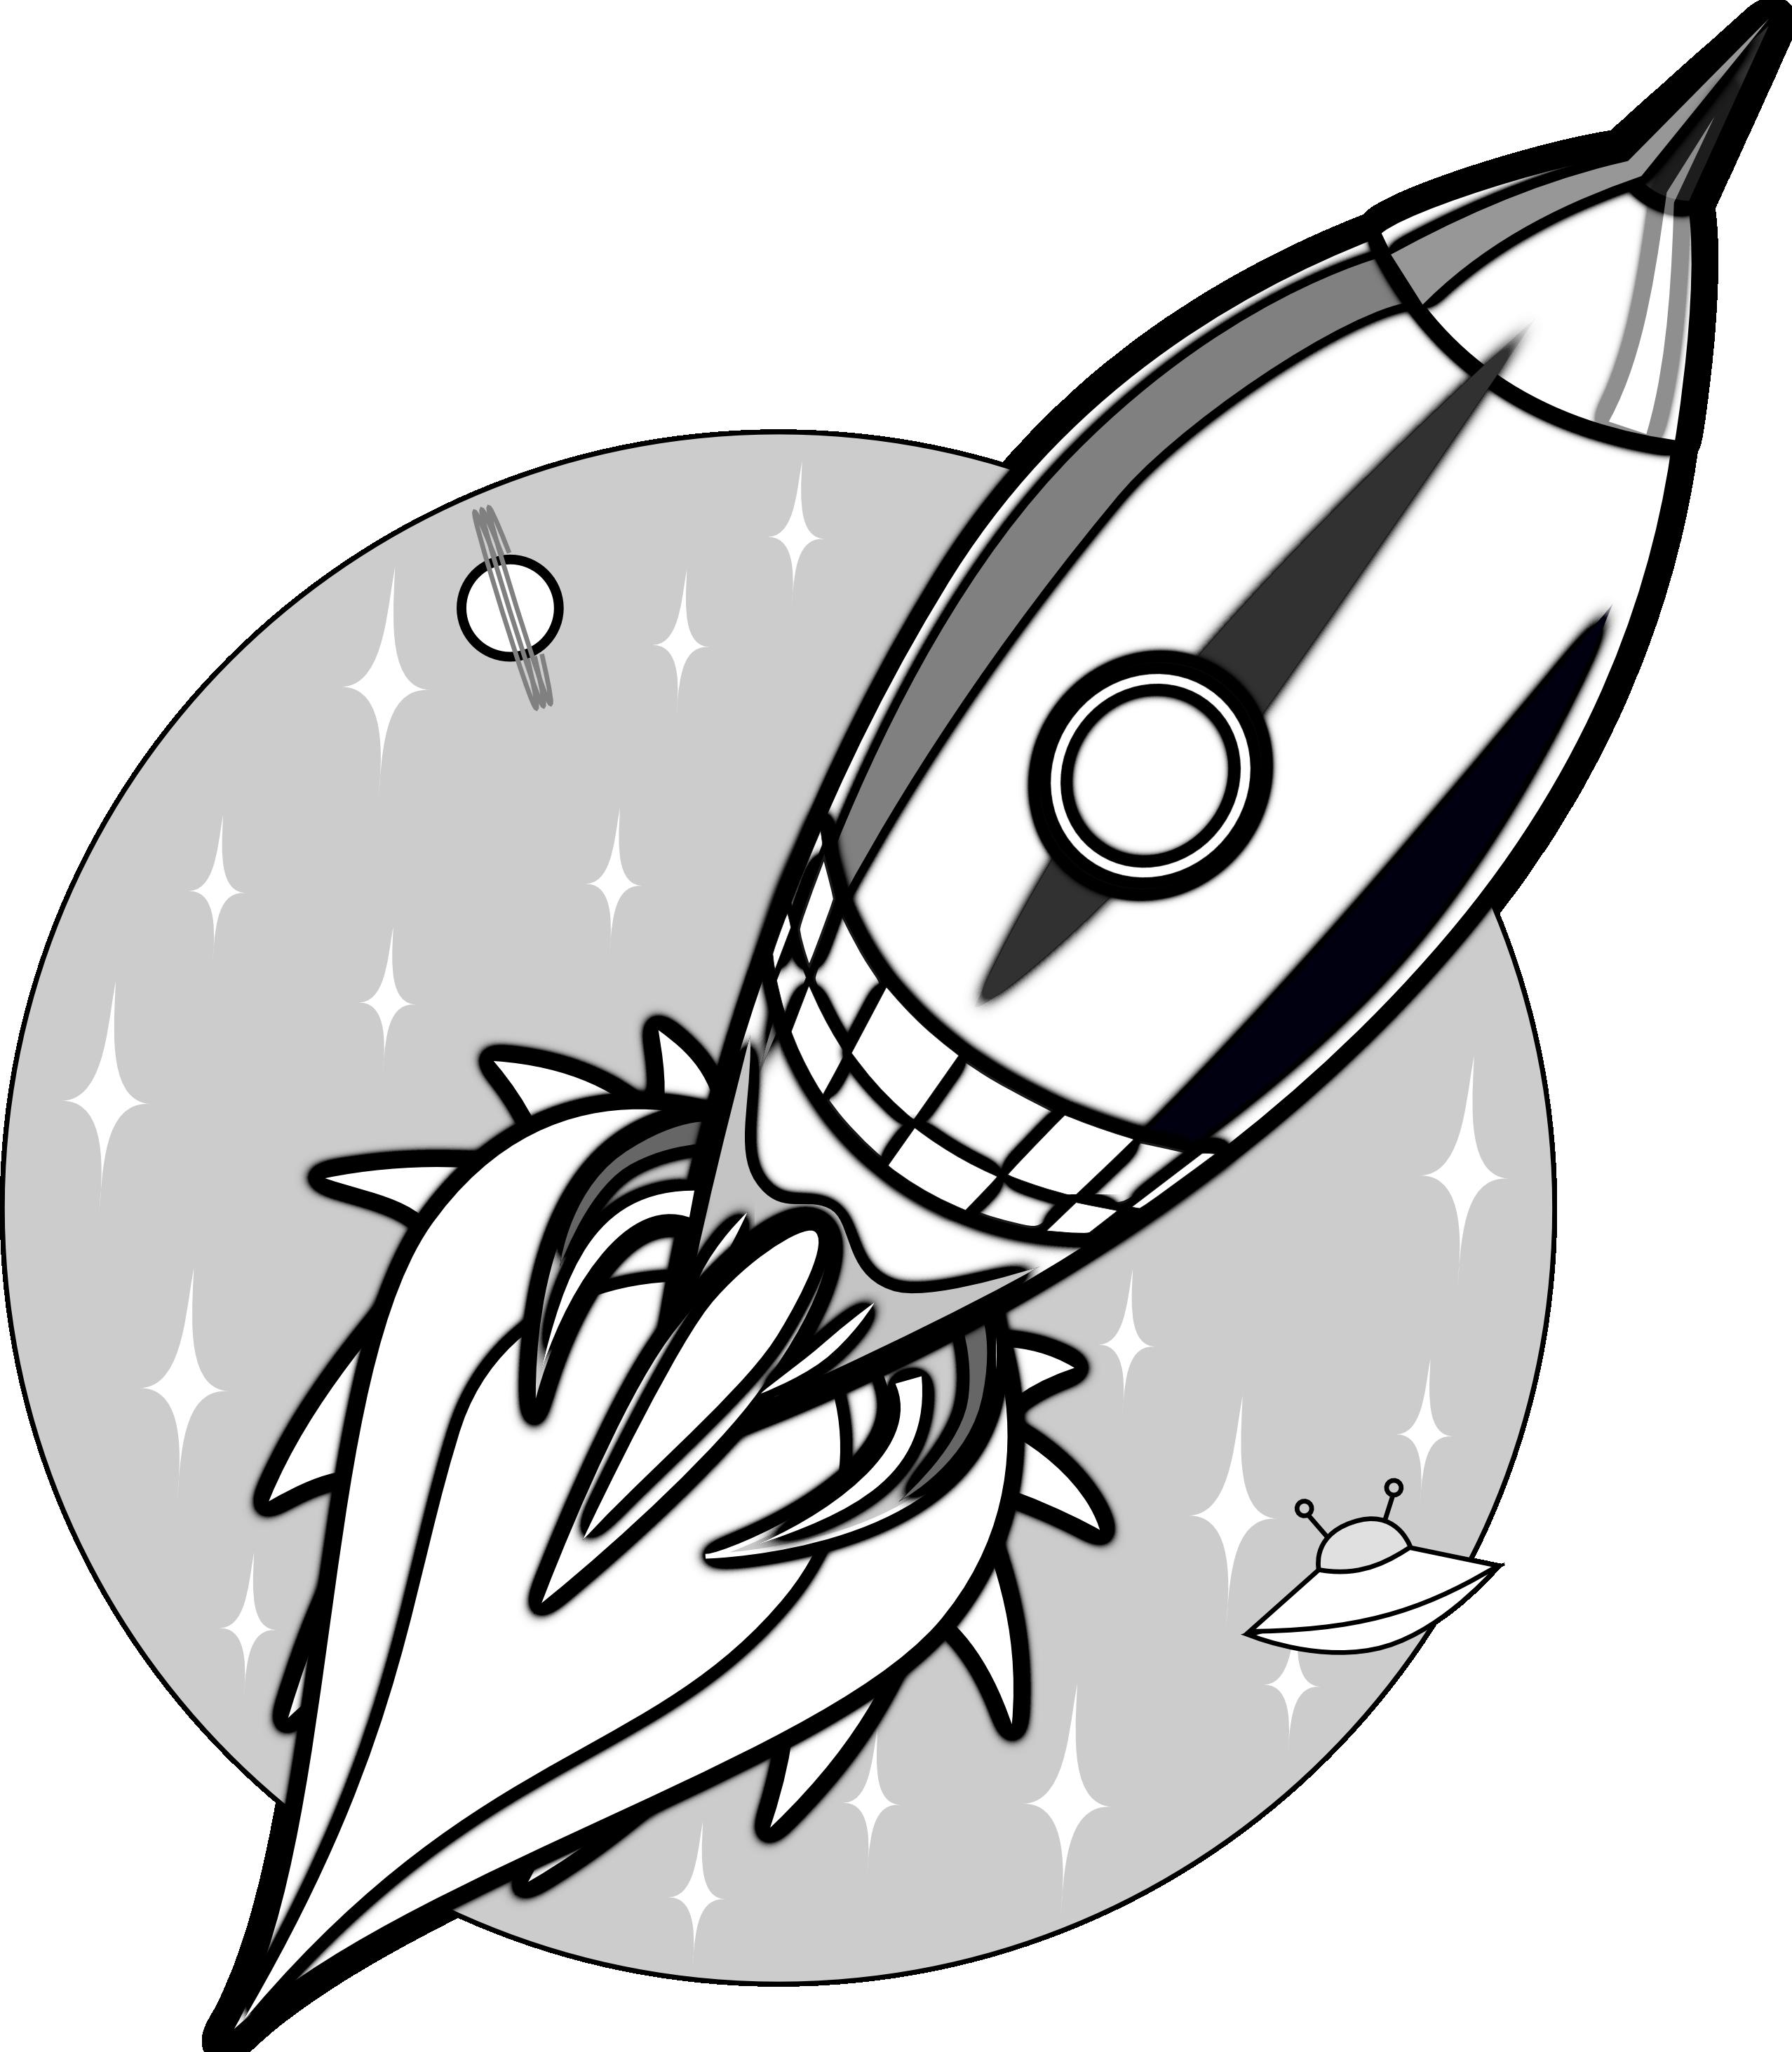 2555x2926 Cartoon Rocket Clipart